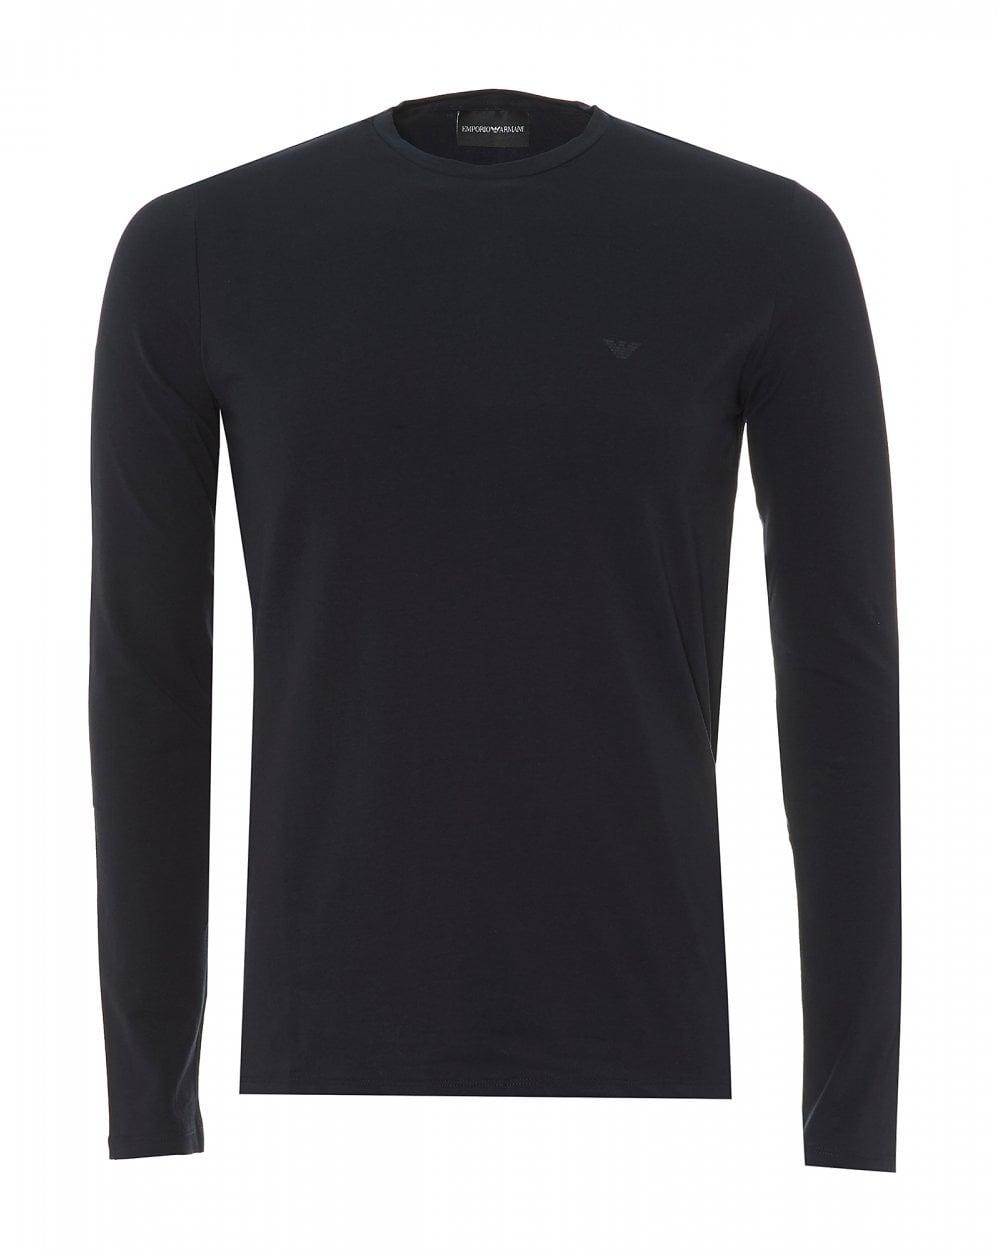 8b4c9d0b Emporio Armani Mens Basic Long Sleeve T-Shirt, Navy Blue Regular ...